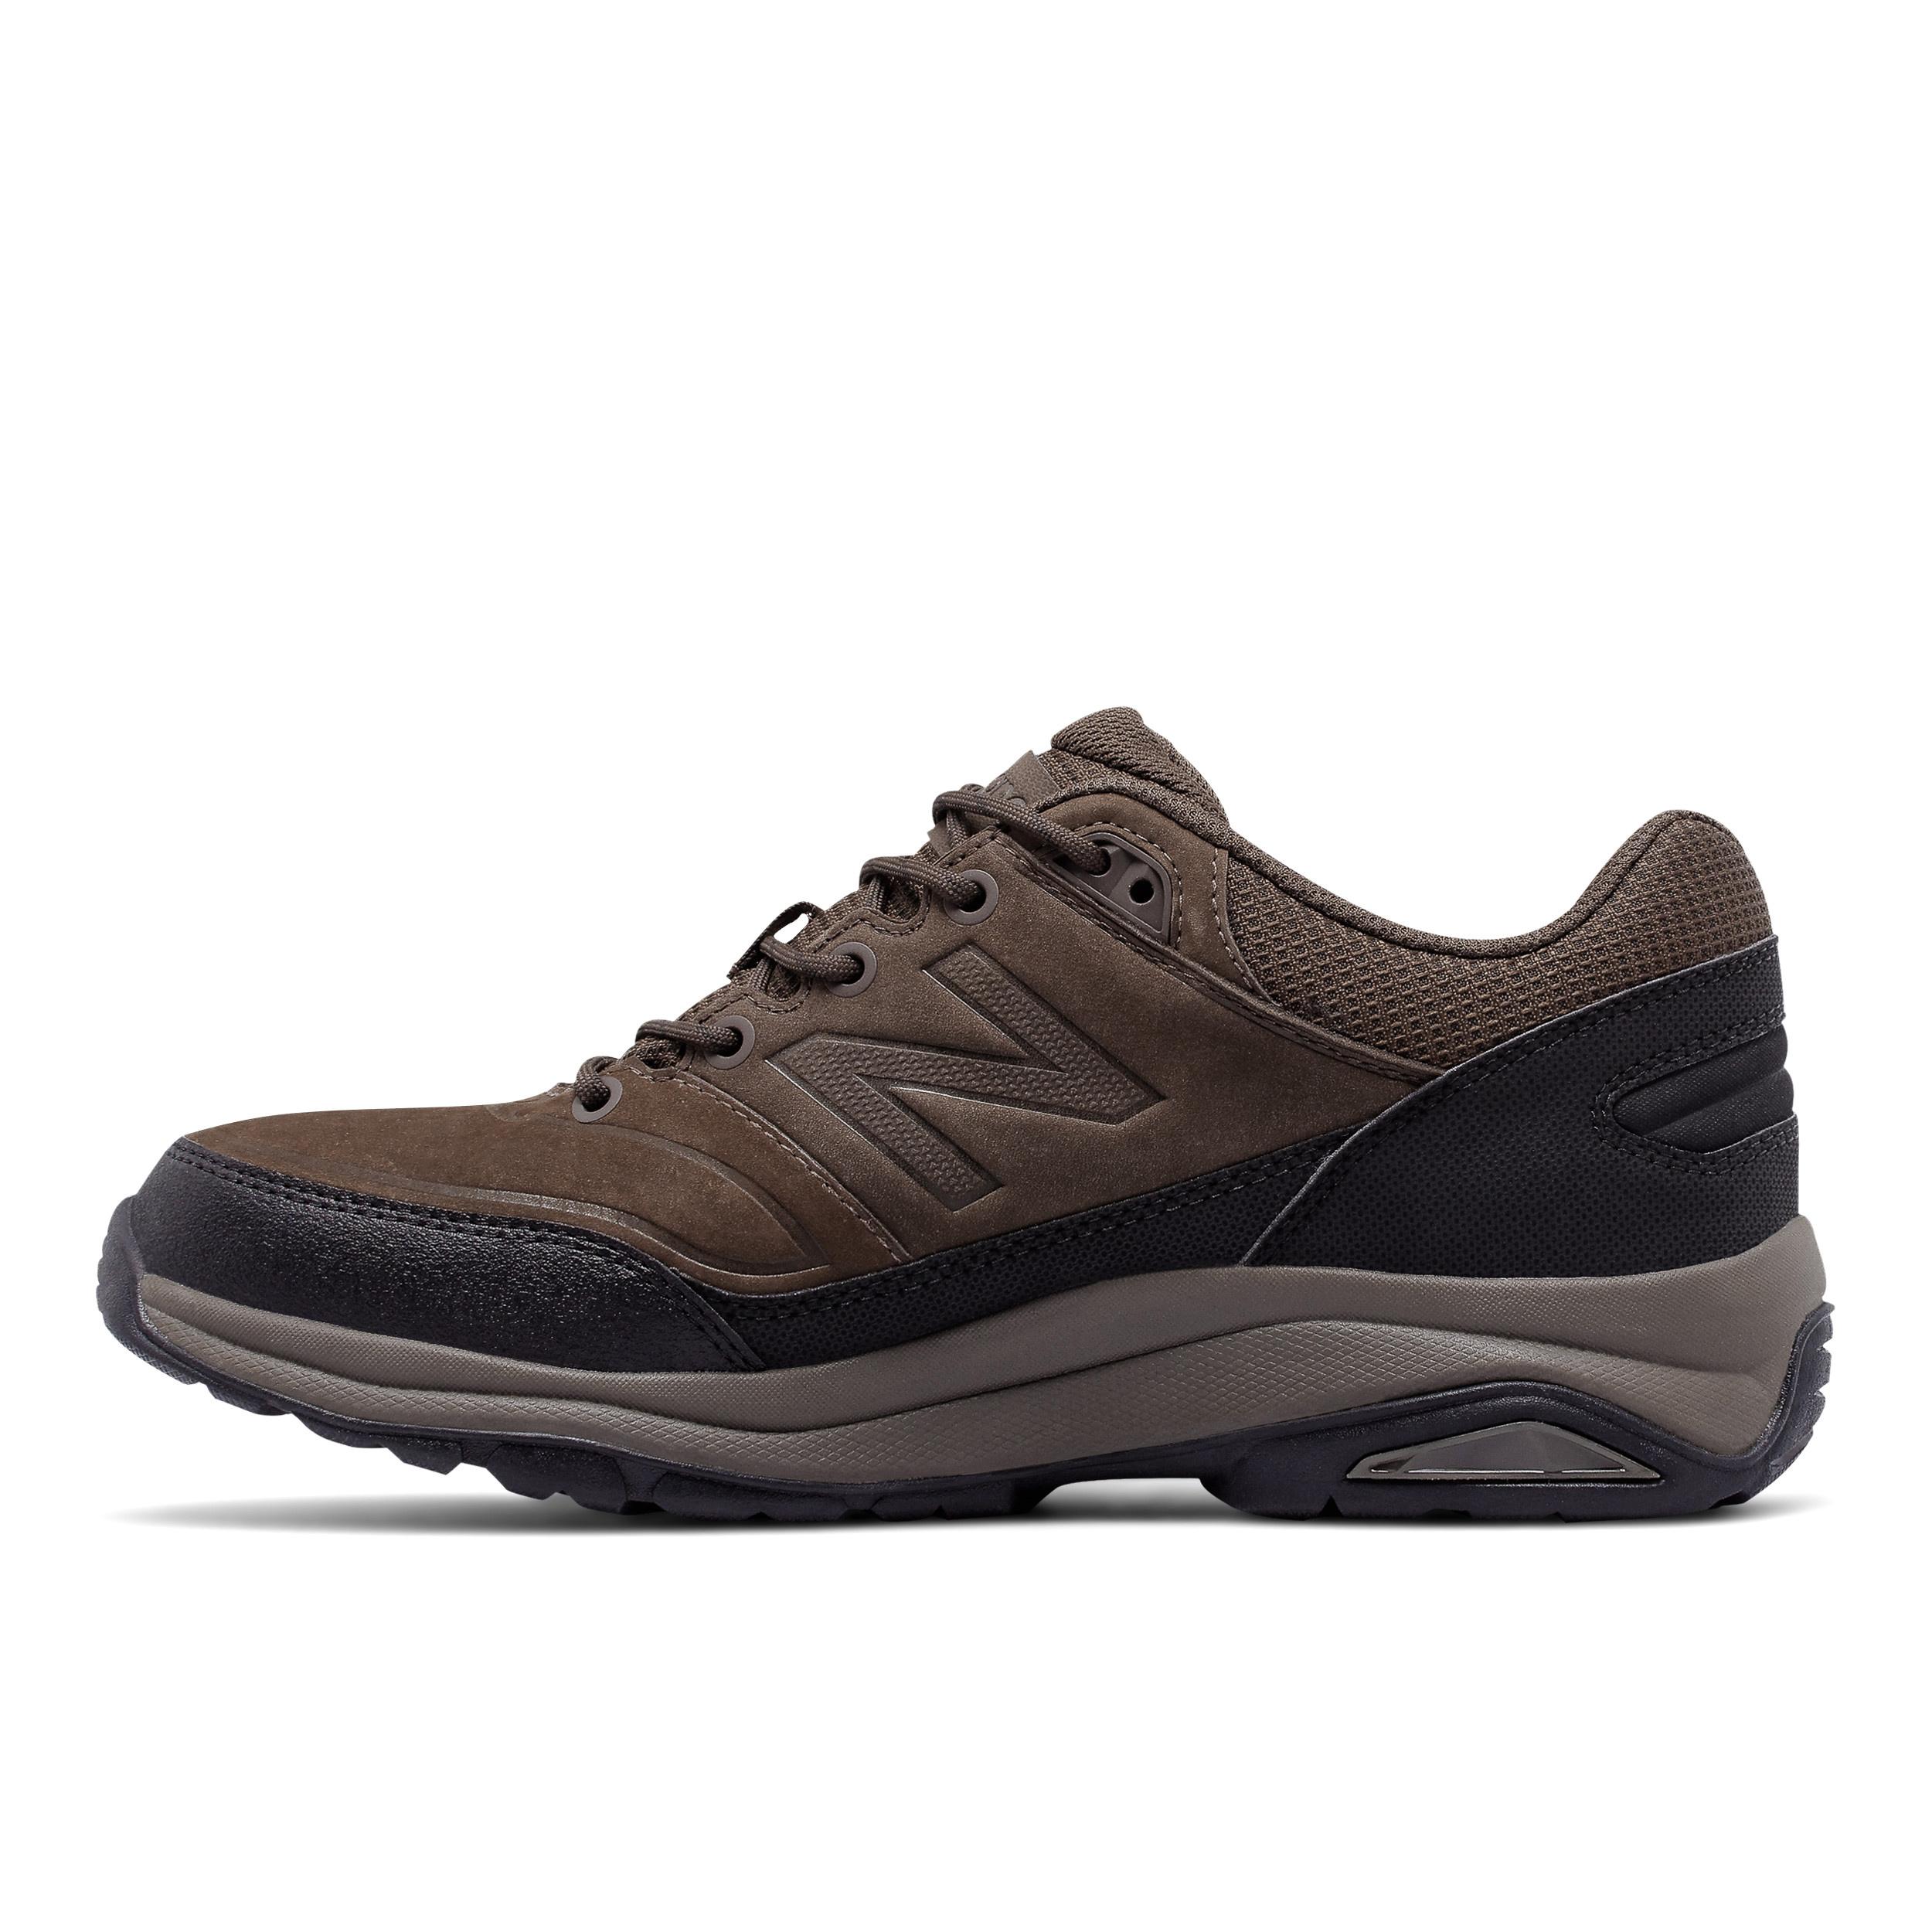 Mens 1300 Walking V1 Men by New Balance